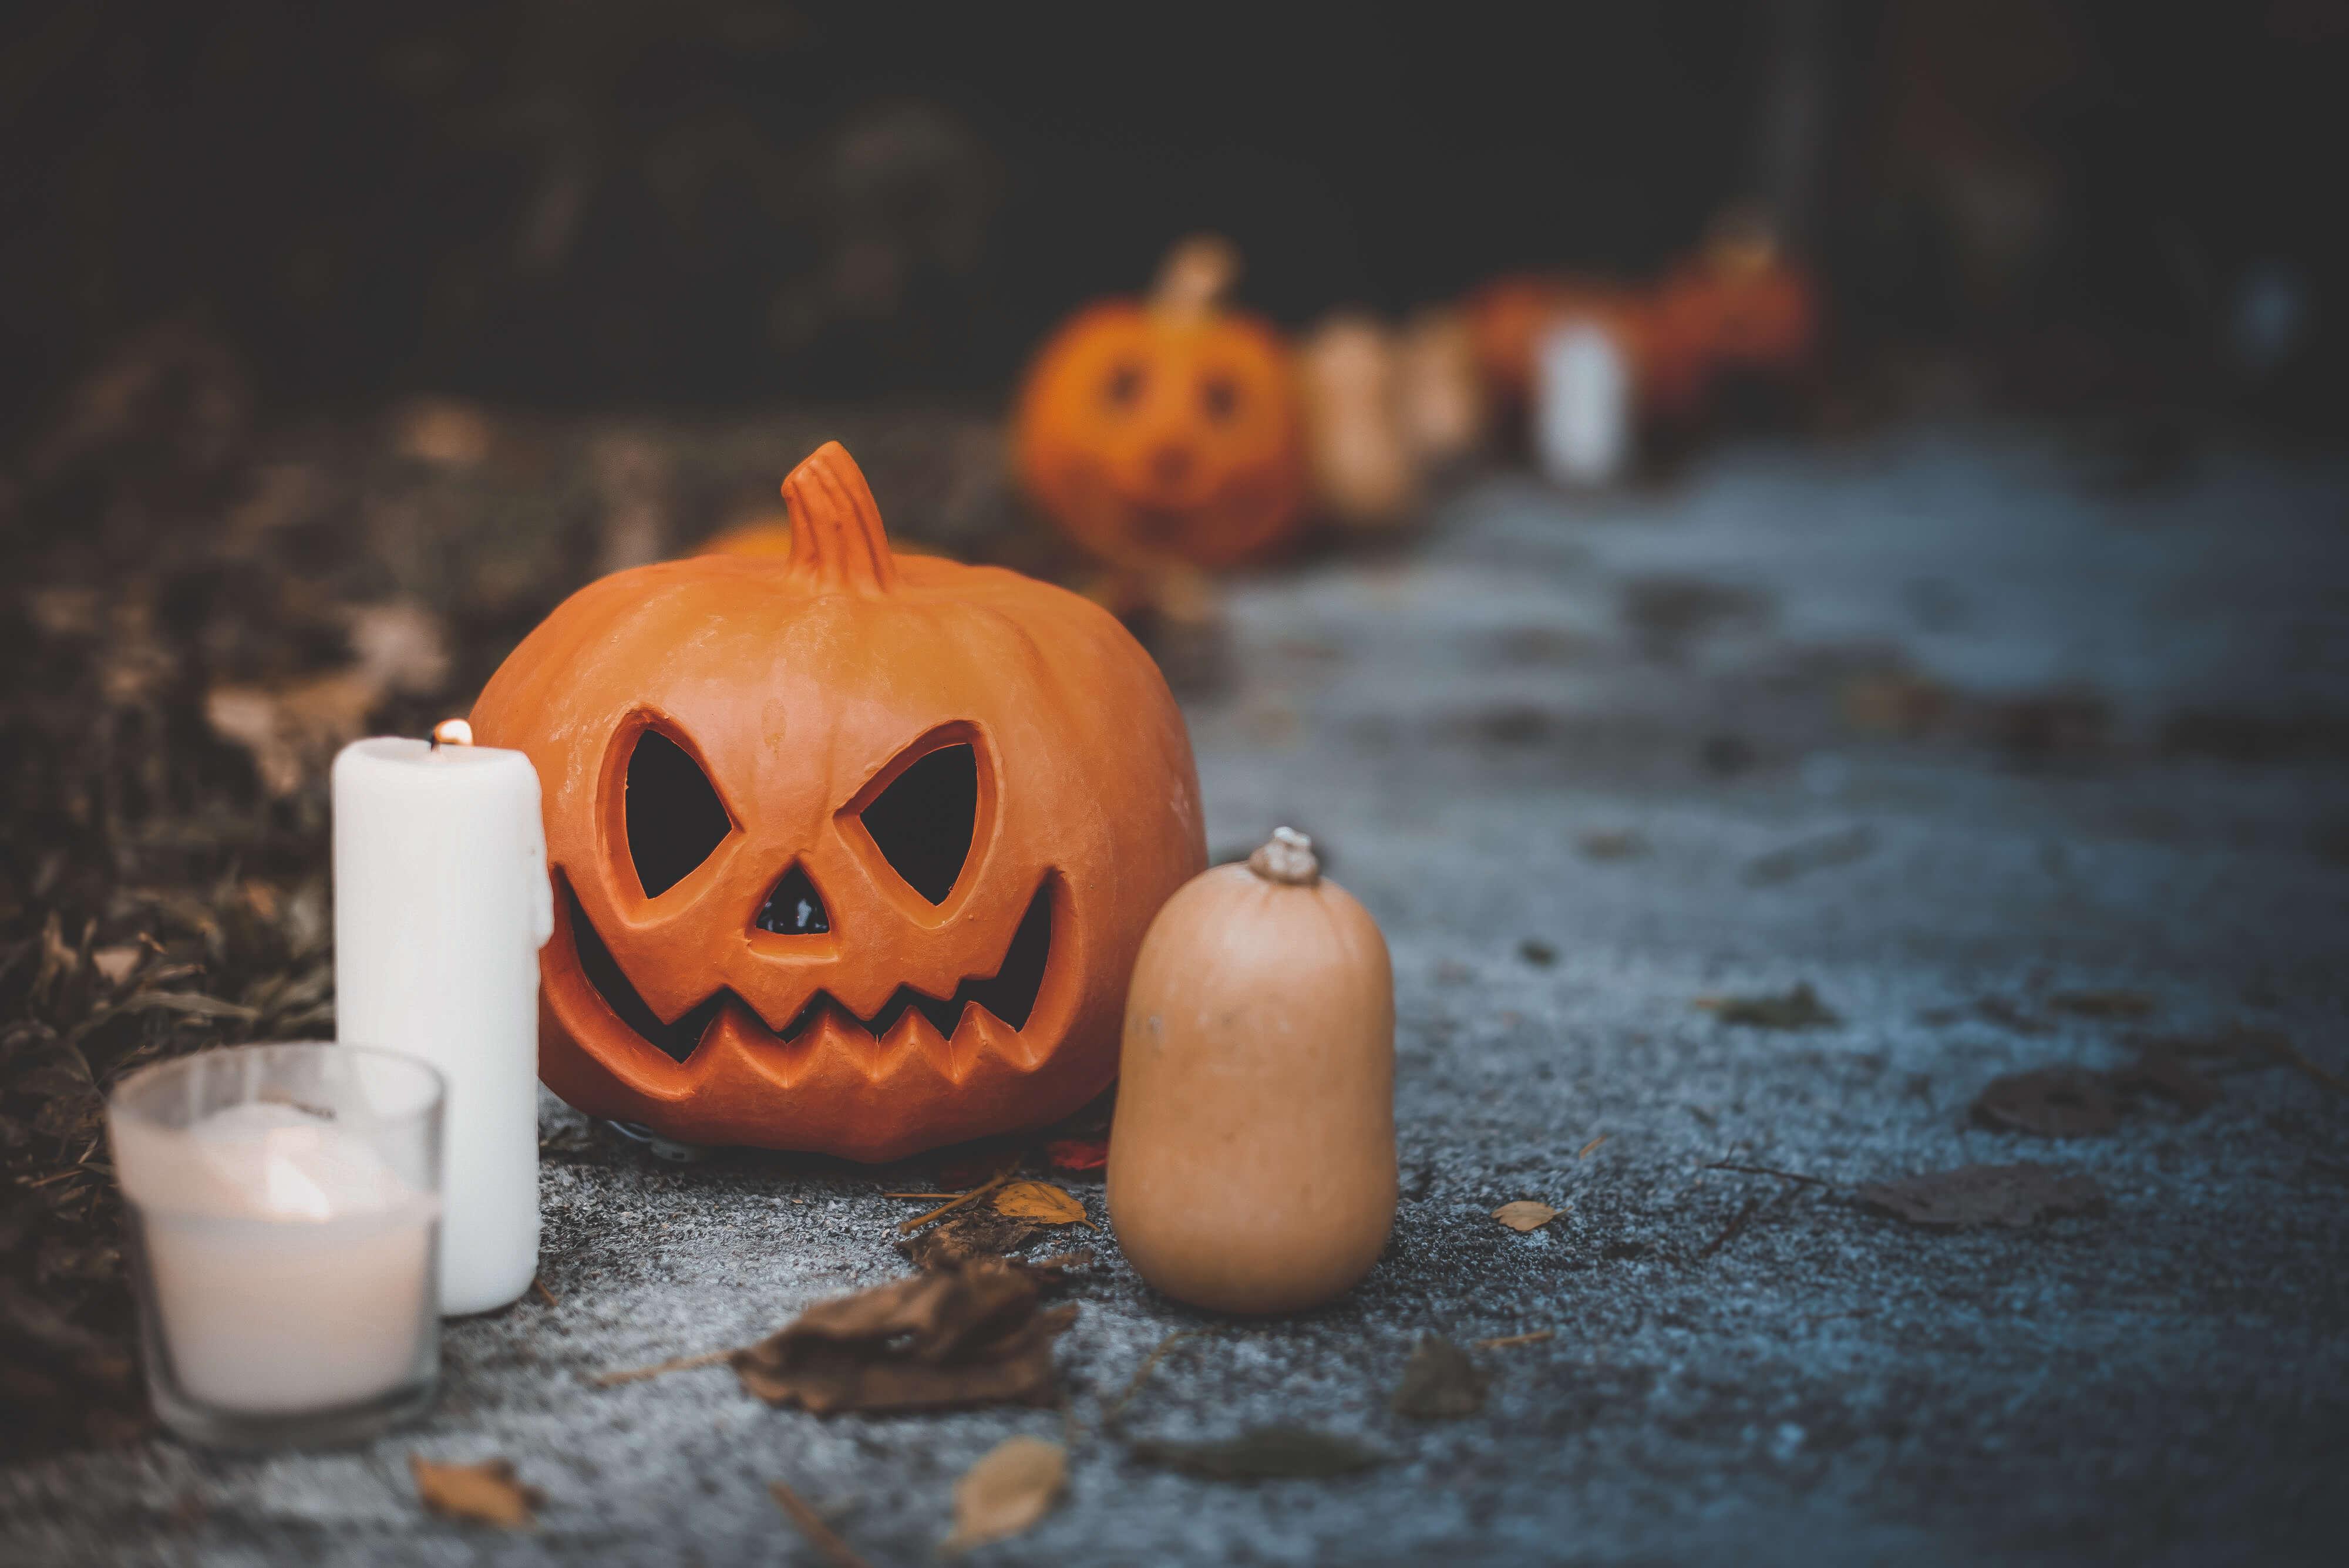 https://sleeklens.com/wp-content/uploads/2018/10/halloween-fall-lightroom-presets-sleeklens-after-3.jpg